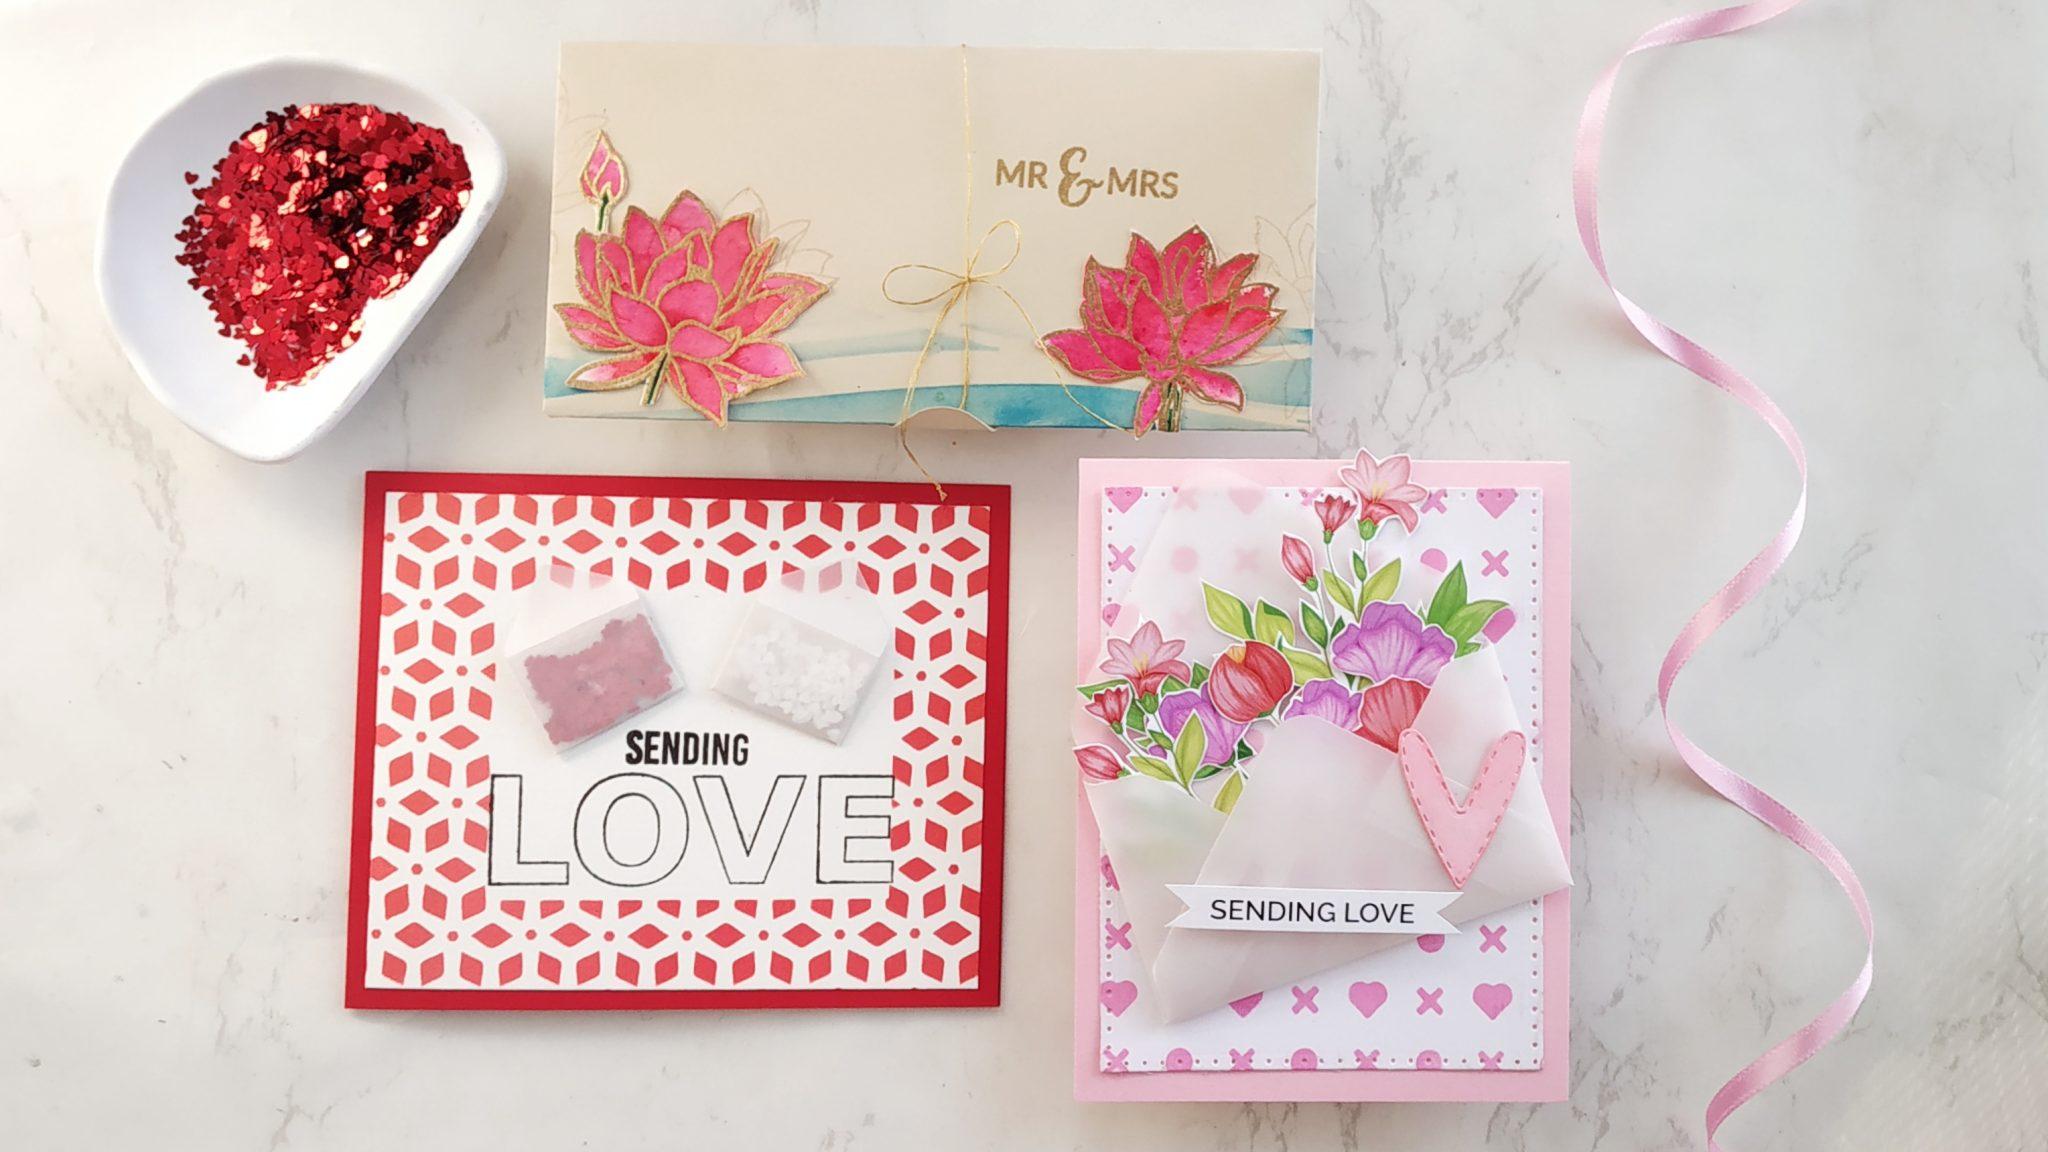 DIY envelopes - Send love in unique envelopes Video tutorial 10